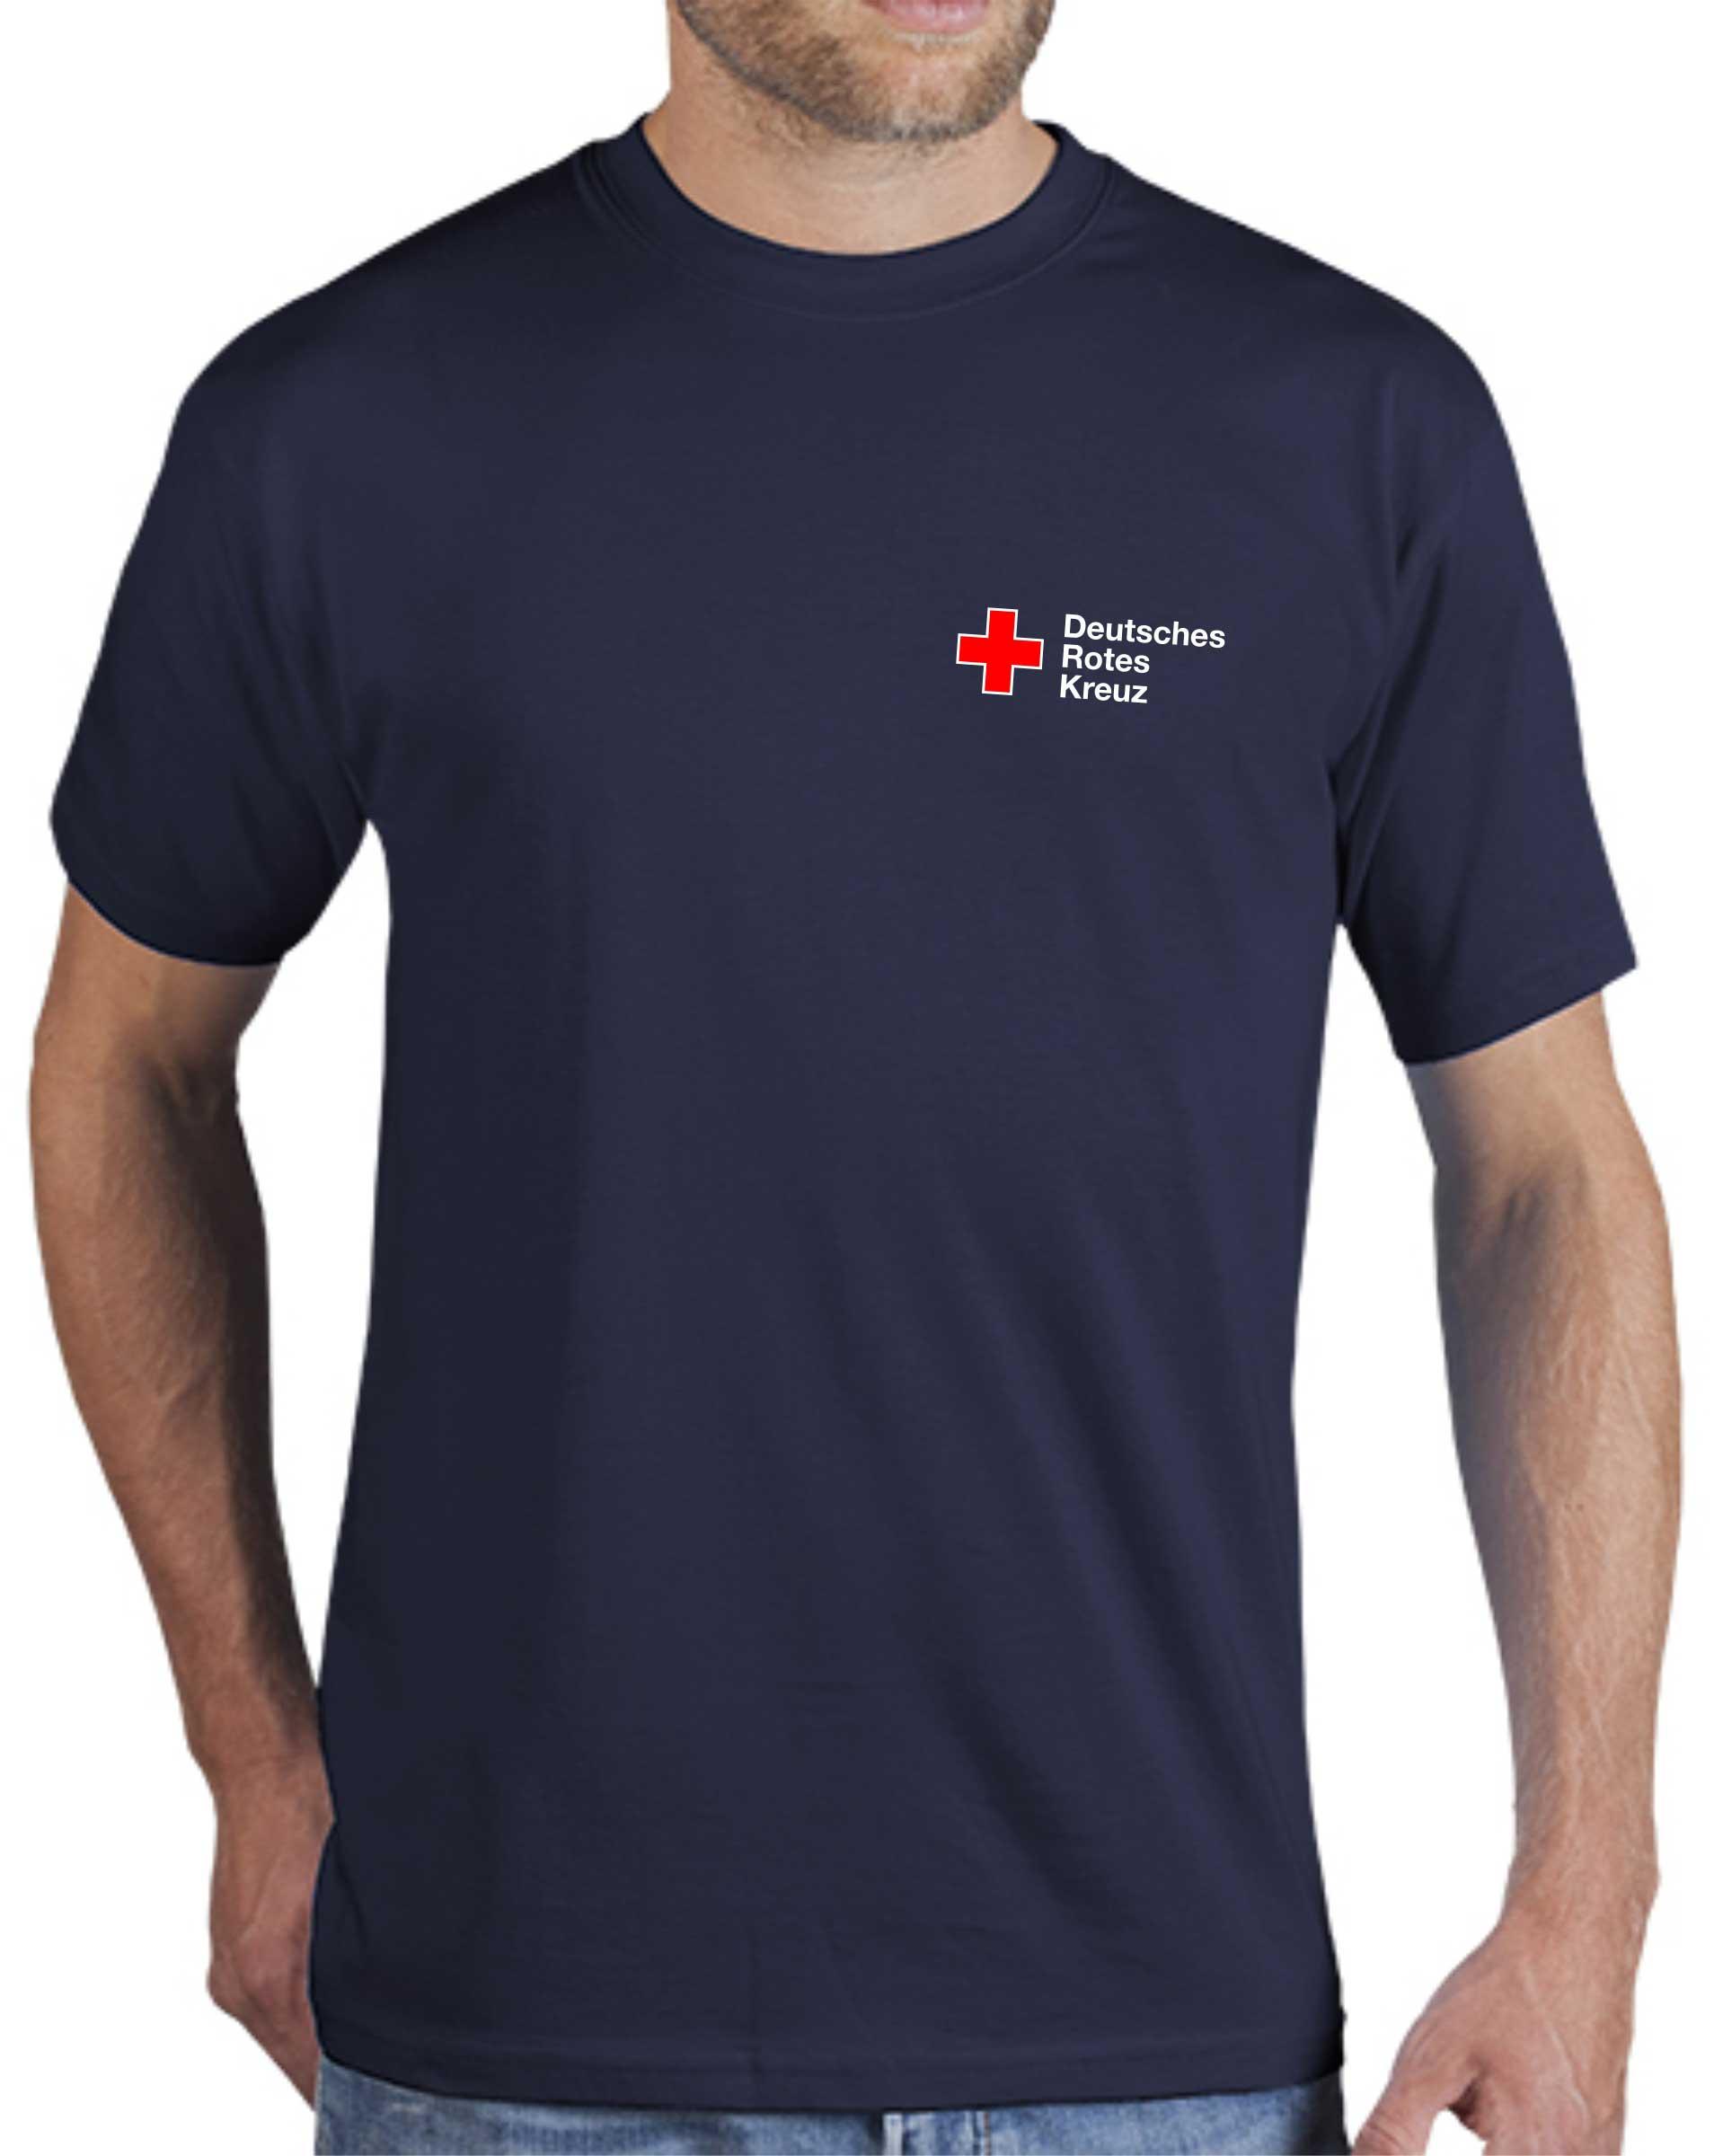 T-Shirt blau mit DRK Kompaktlogo